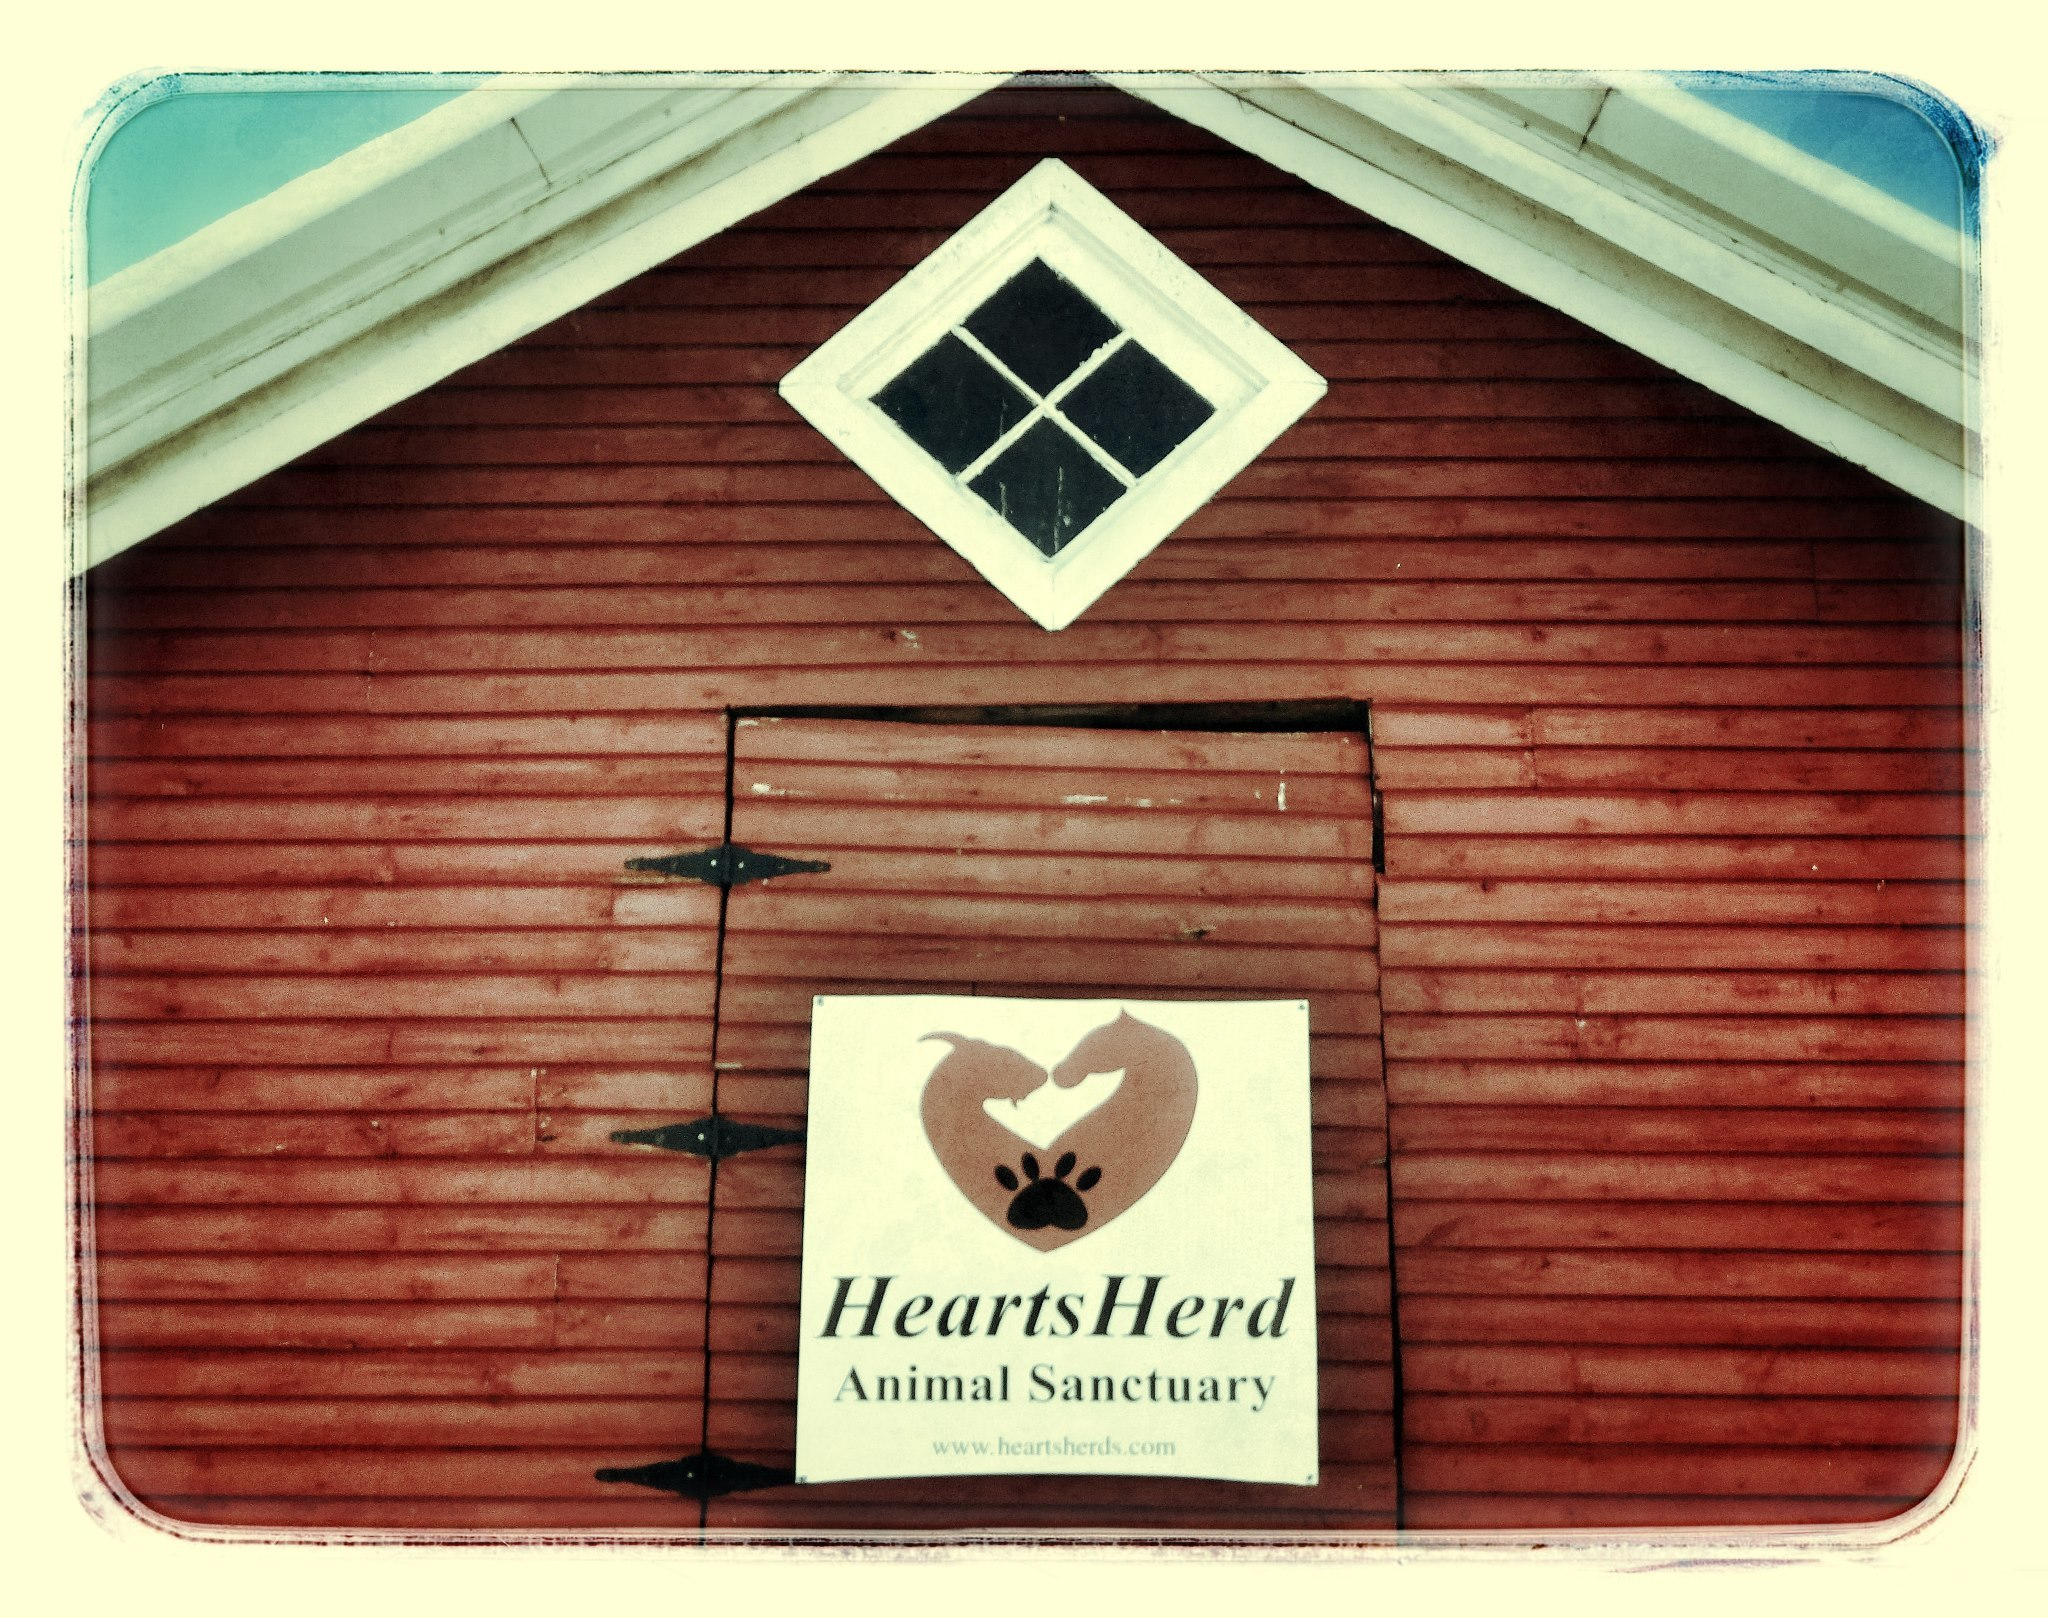 HeartsHerd Animal Sanctuary